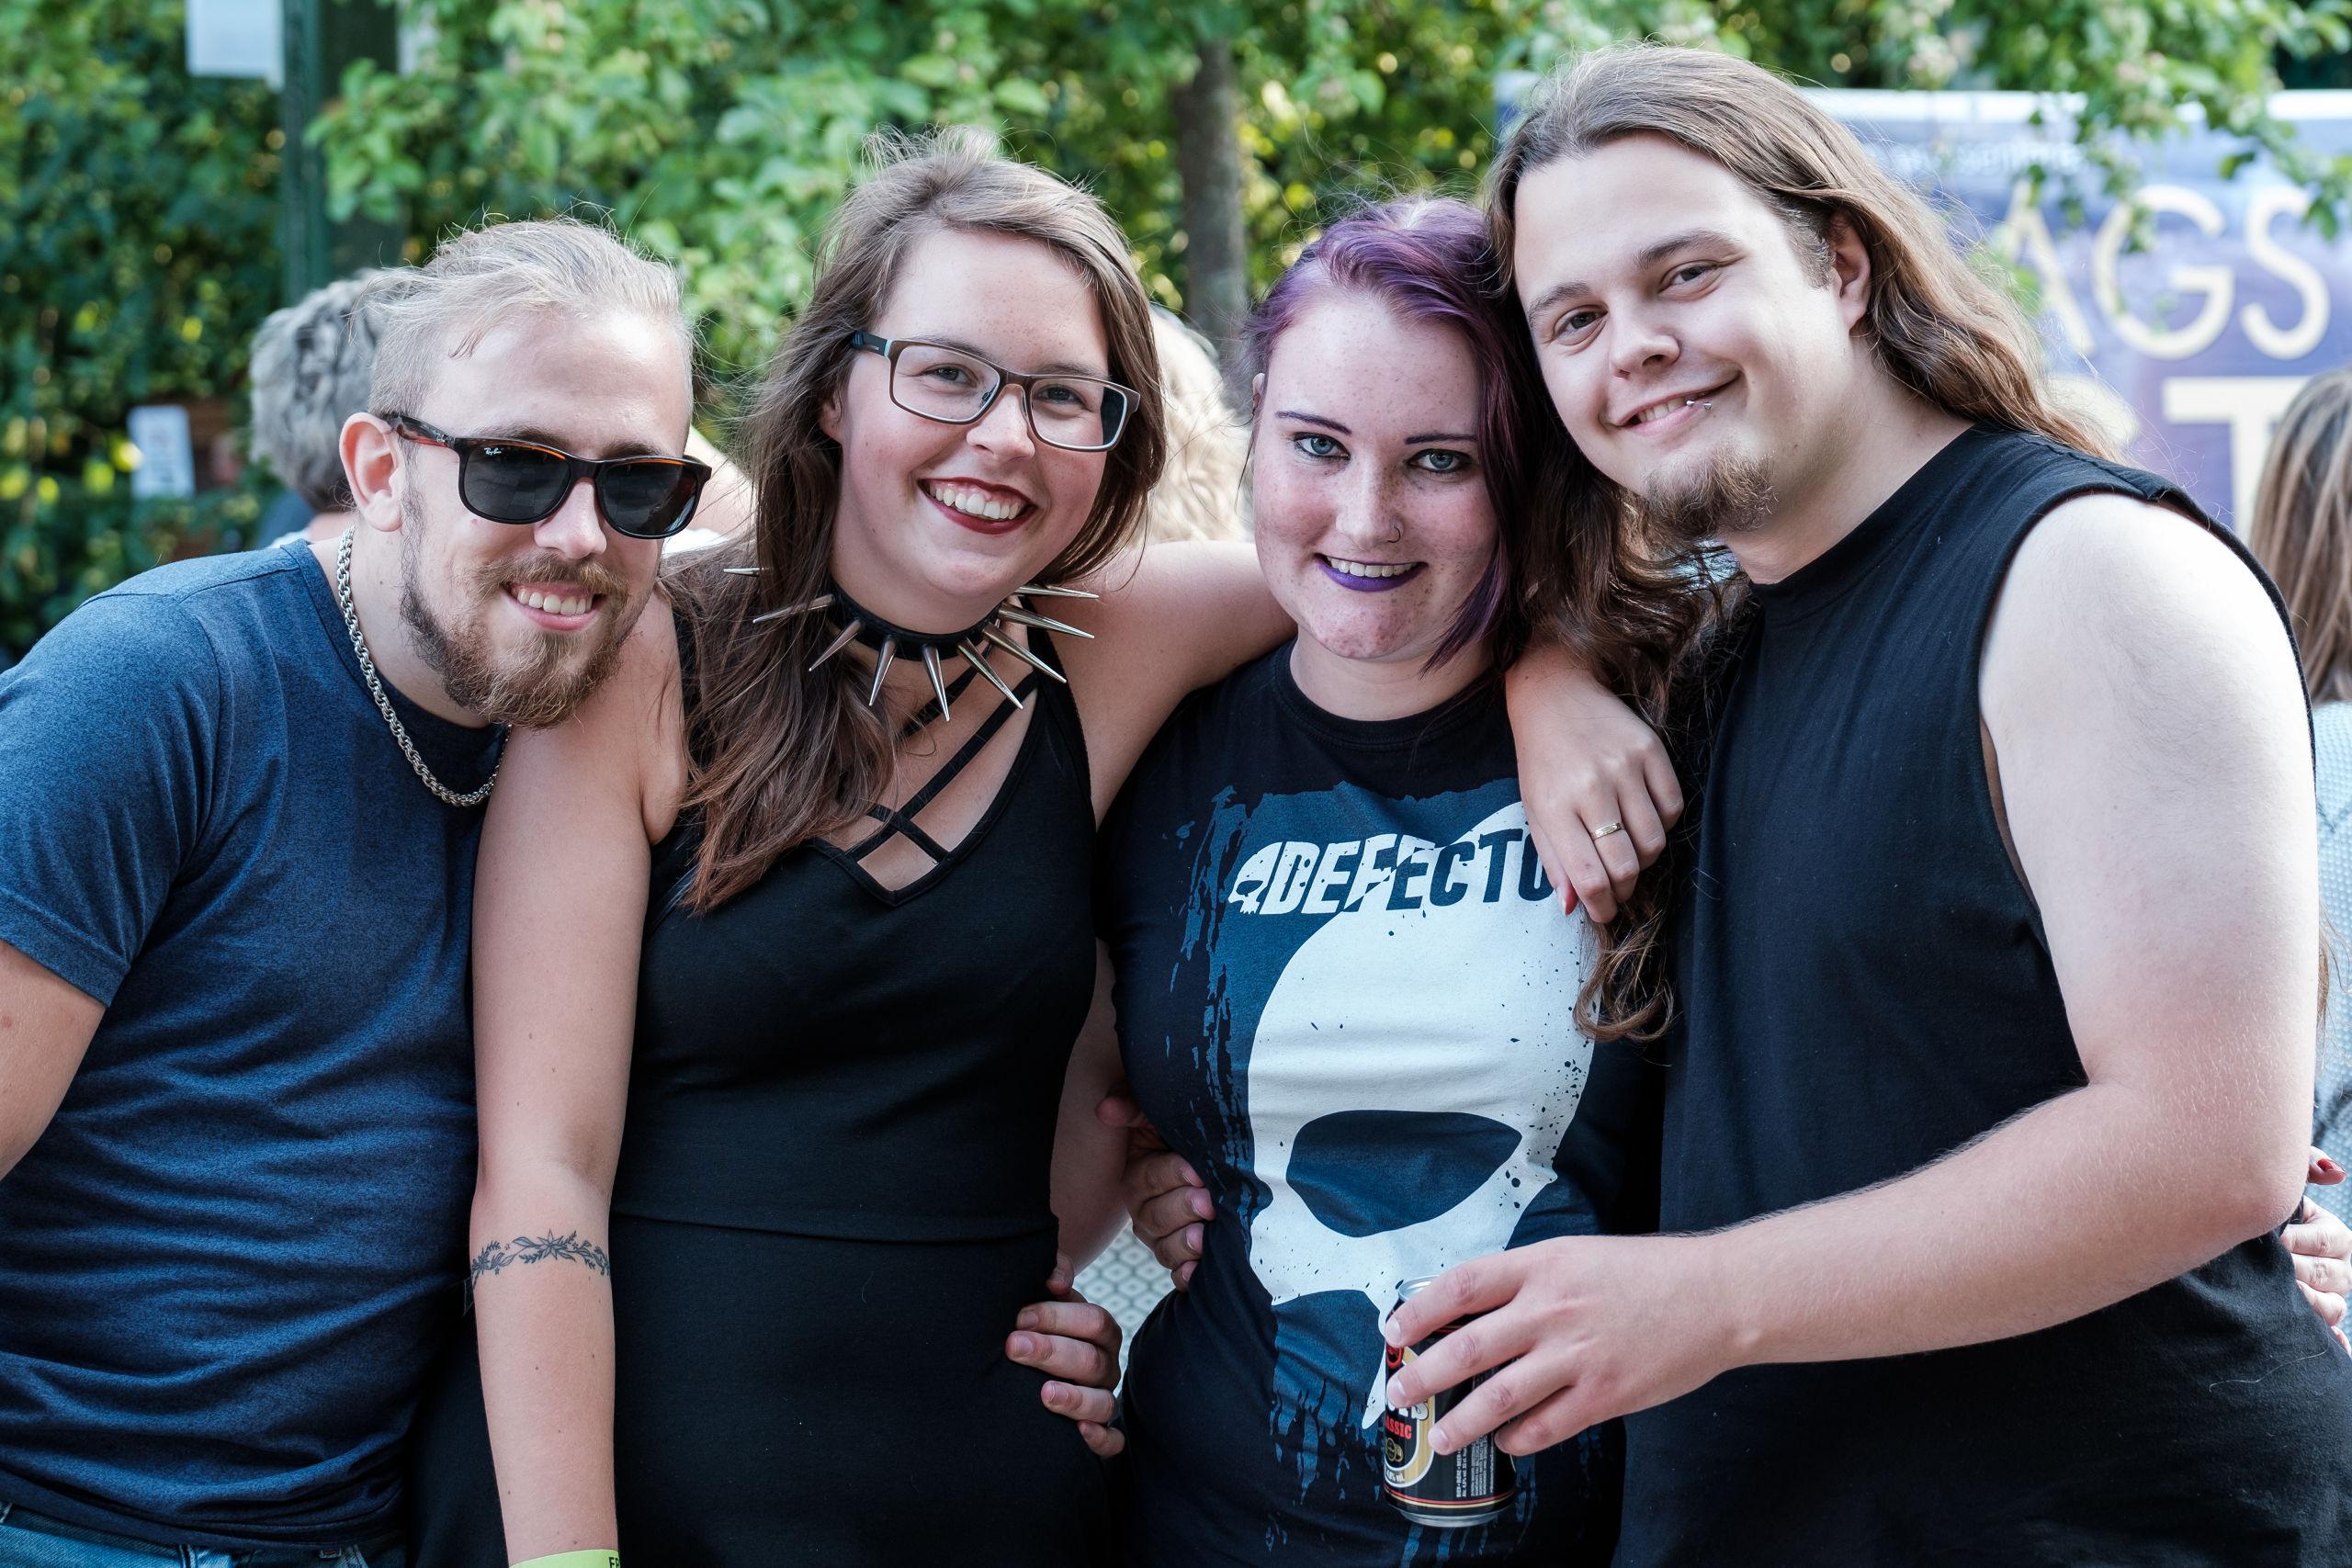 Fra venstre Frederik Luther, Kira Andersen, Chandra Søberg og Dennis Pedersen. Foto: Lasse Sand